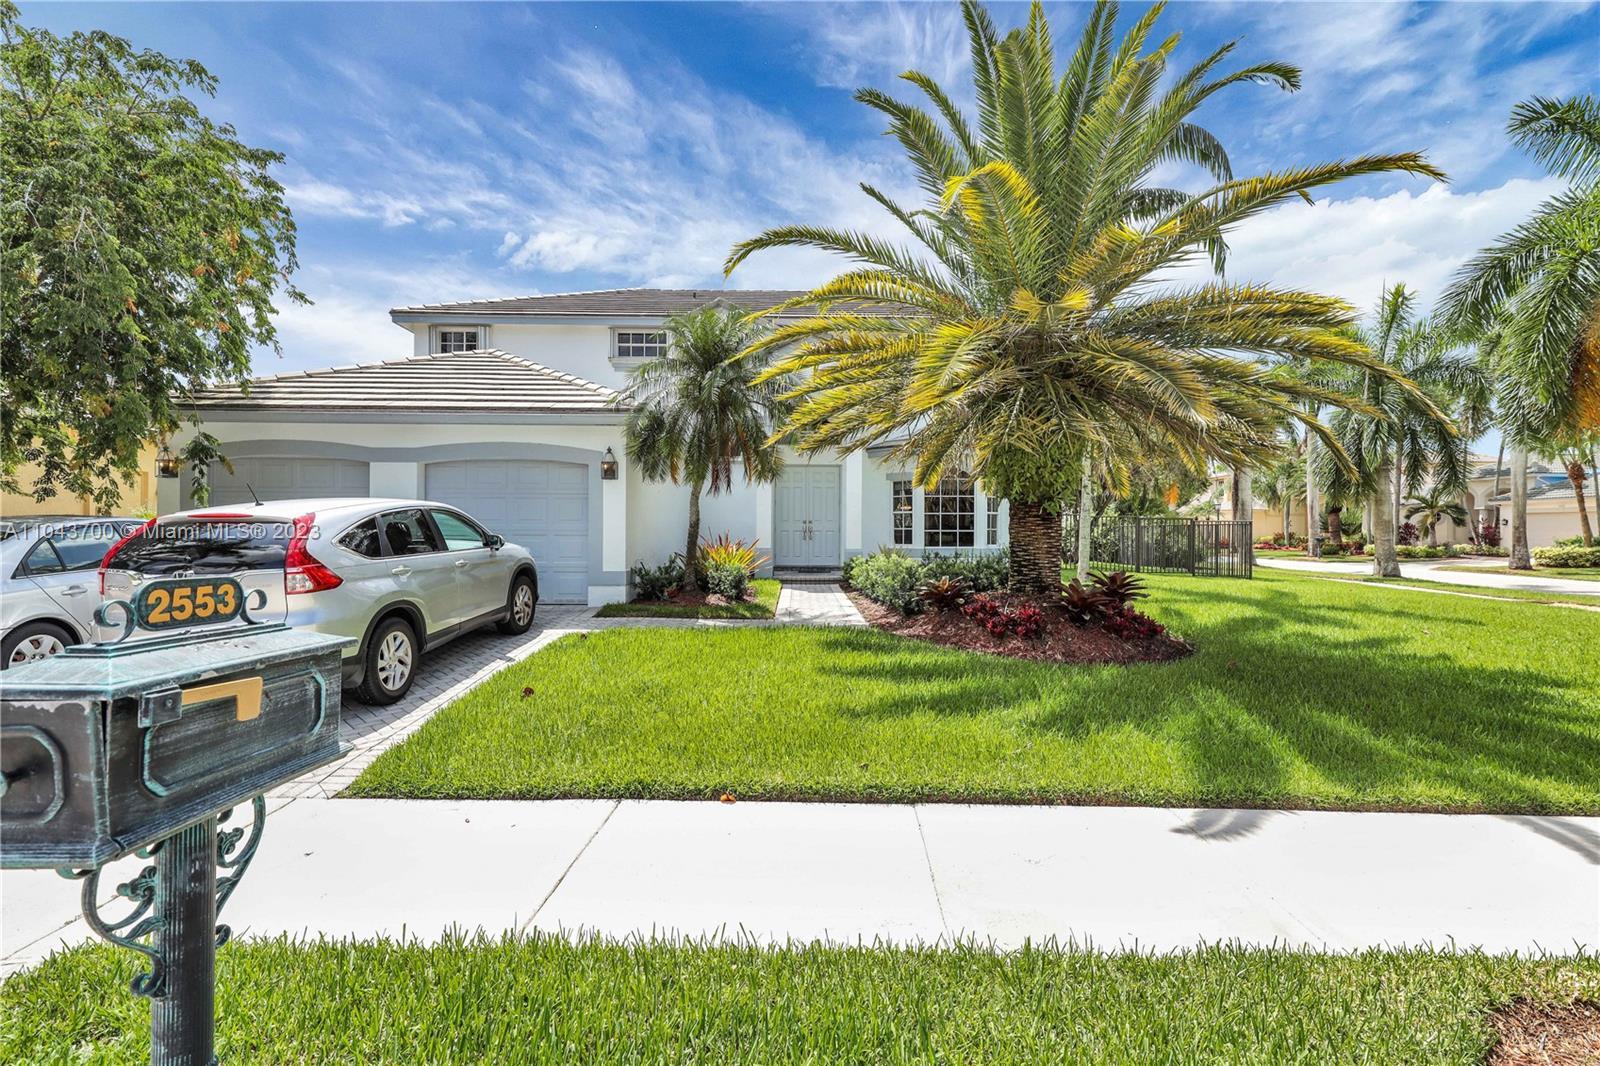 Weston Hills - 2553 Jardin Ter, Weston, FL 33327